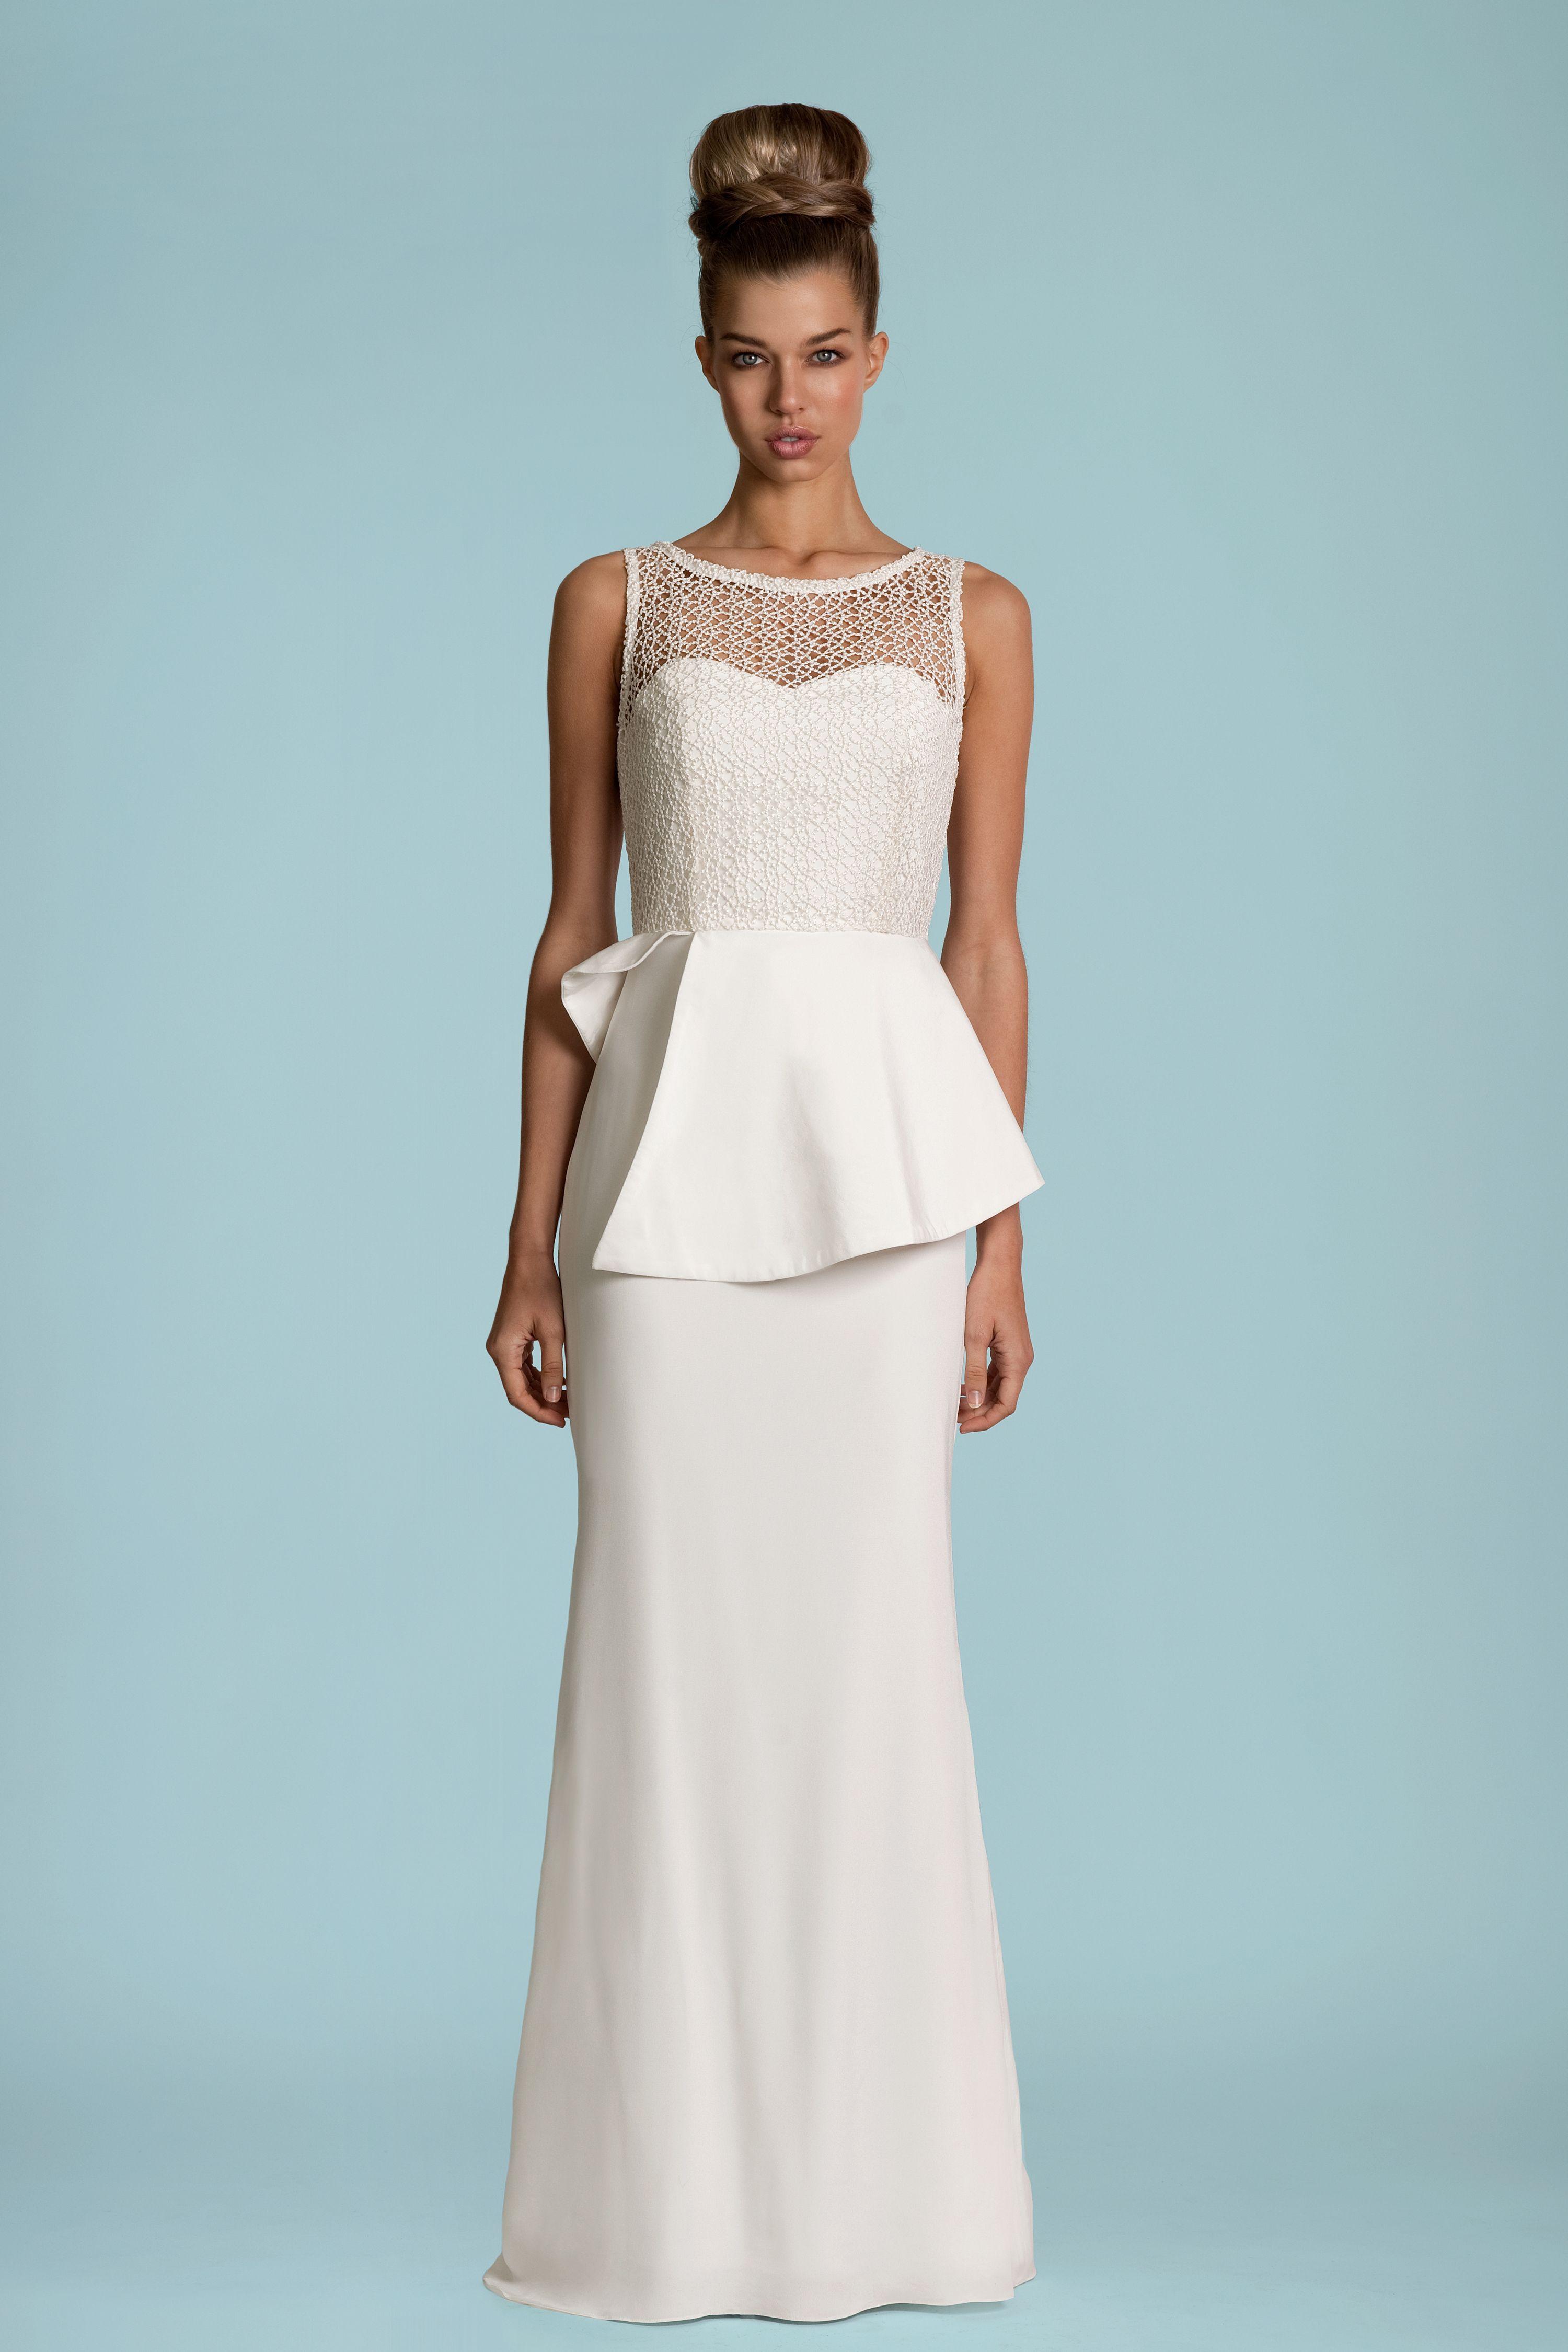 Vintage Style 40s Wedding Dresses in London | Lara Hannah | ash ...